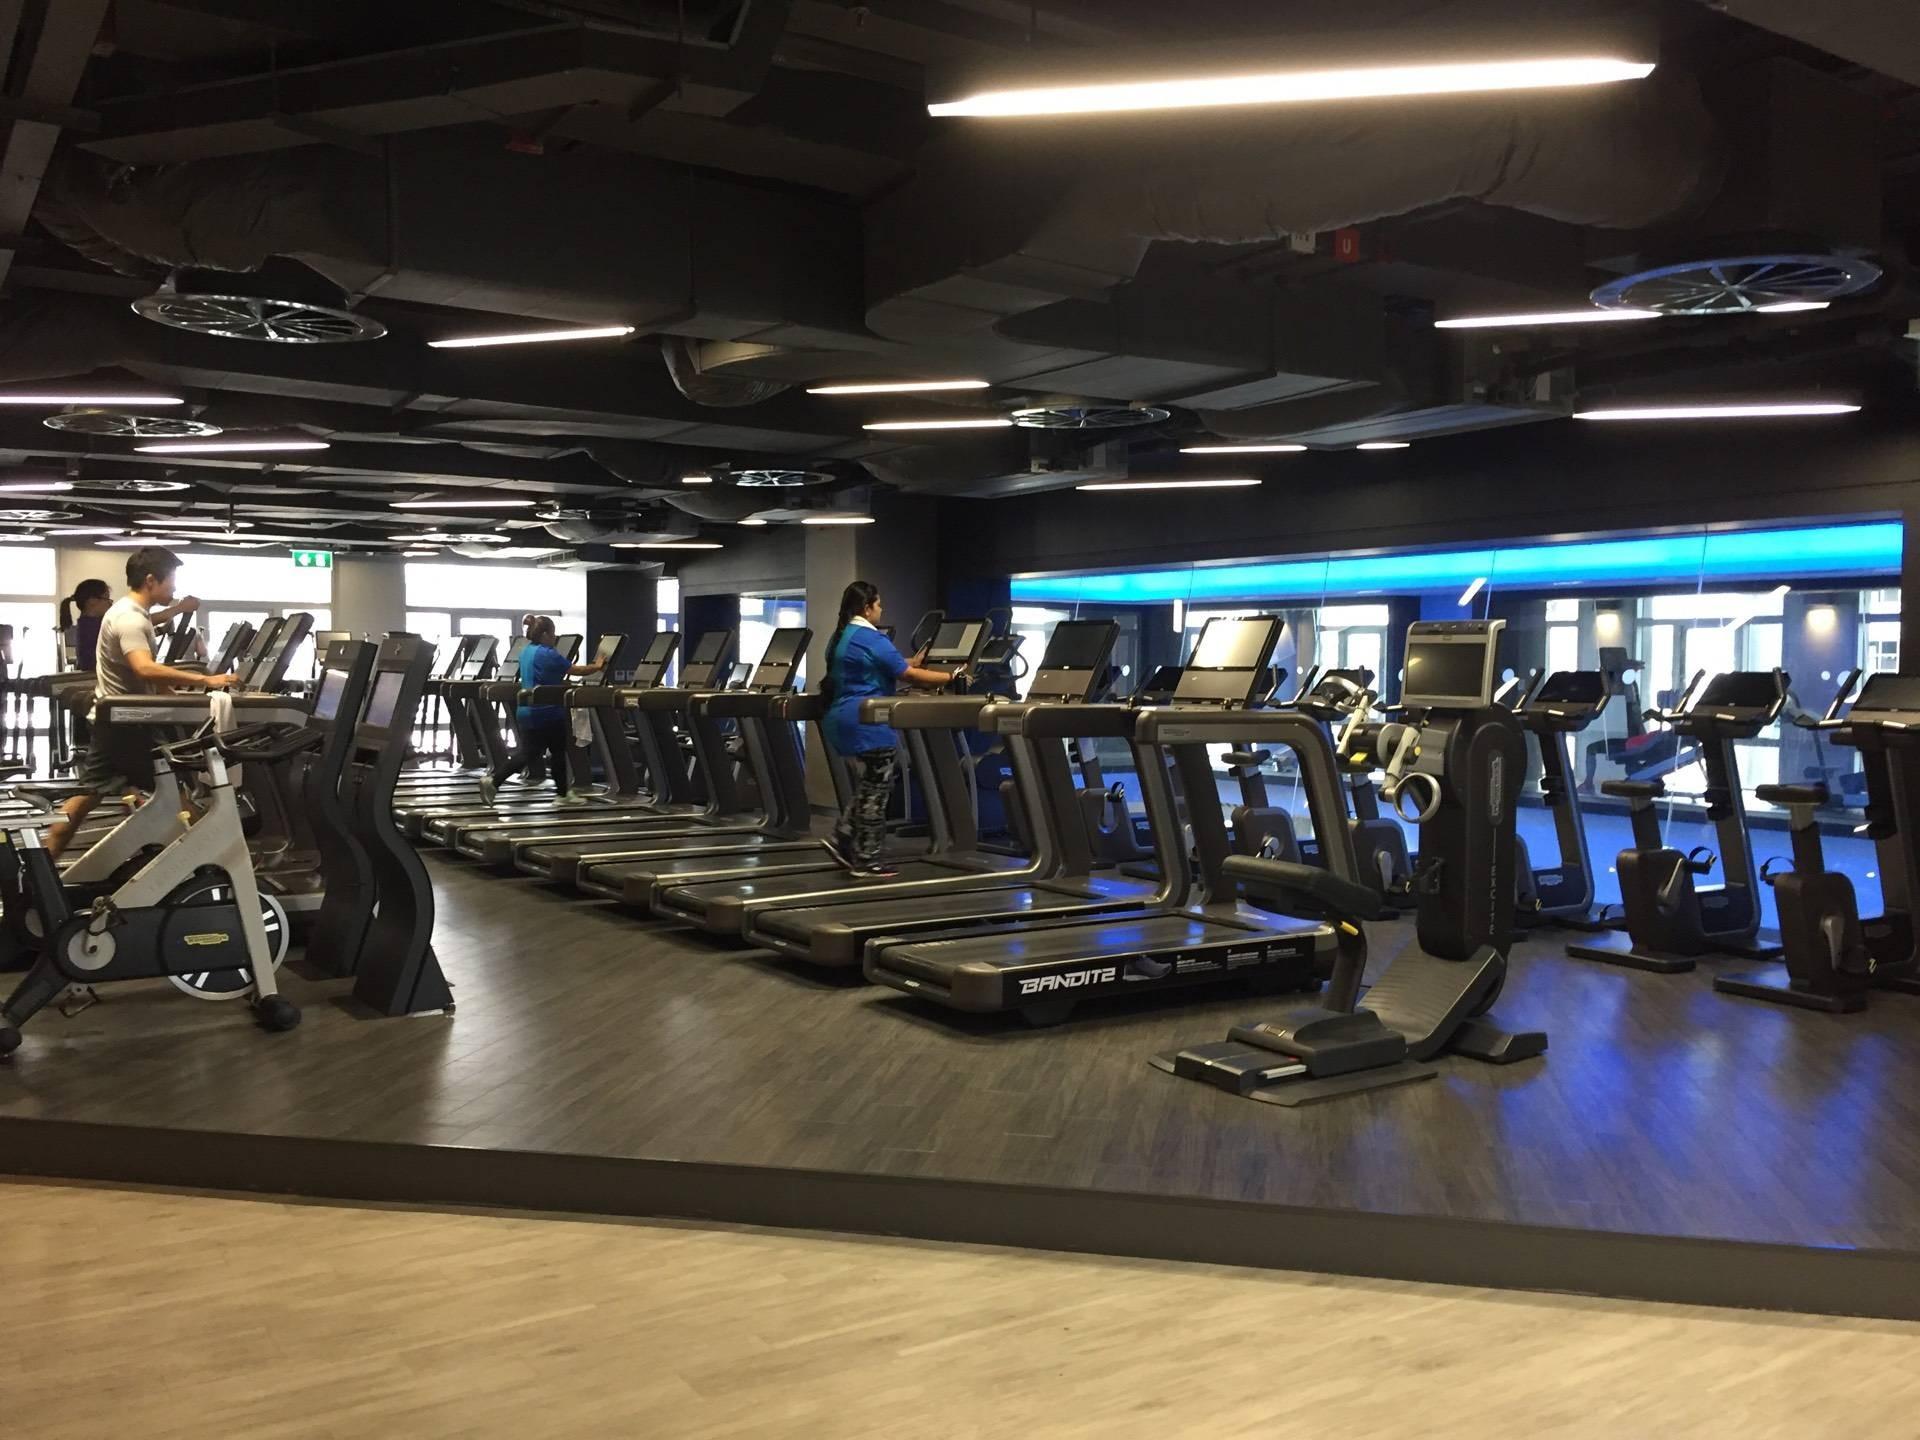 Virgin Active Fitness Club เอ็มไพร์ทาวเวอร์